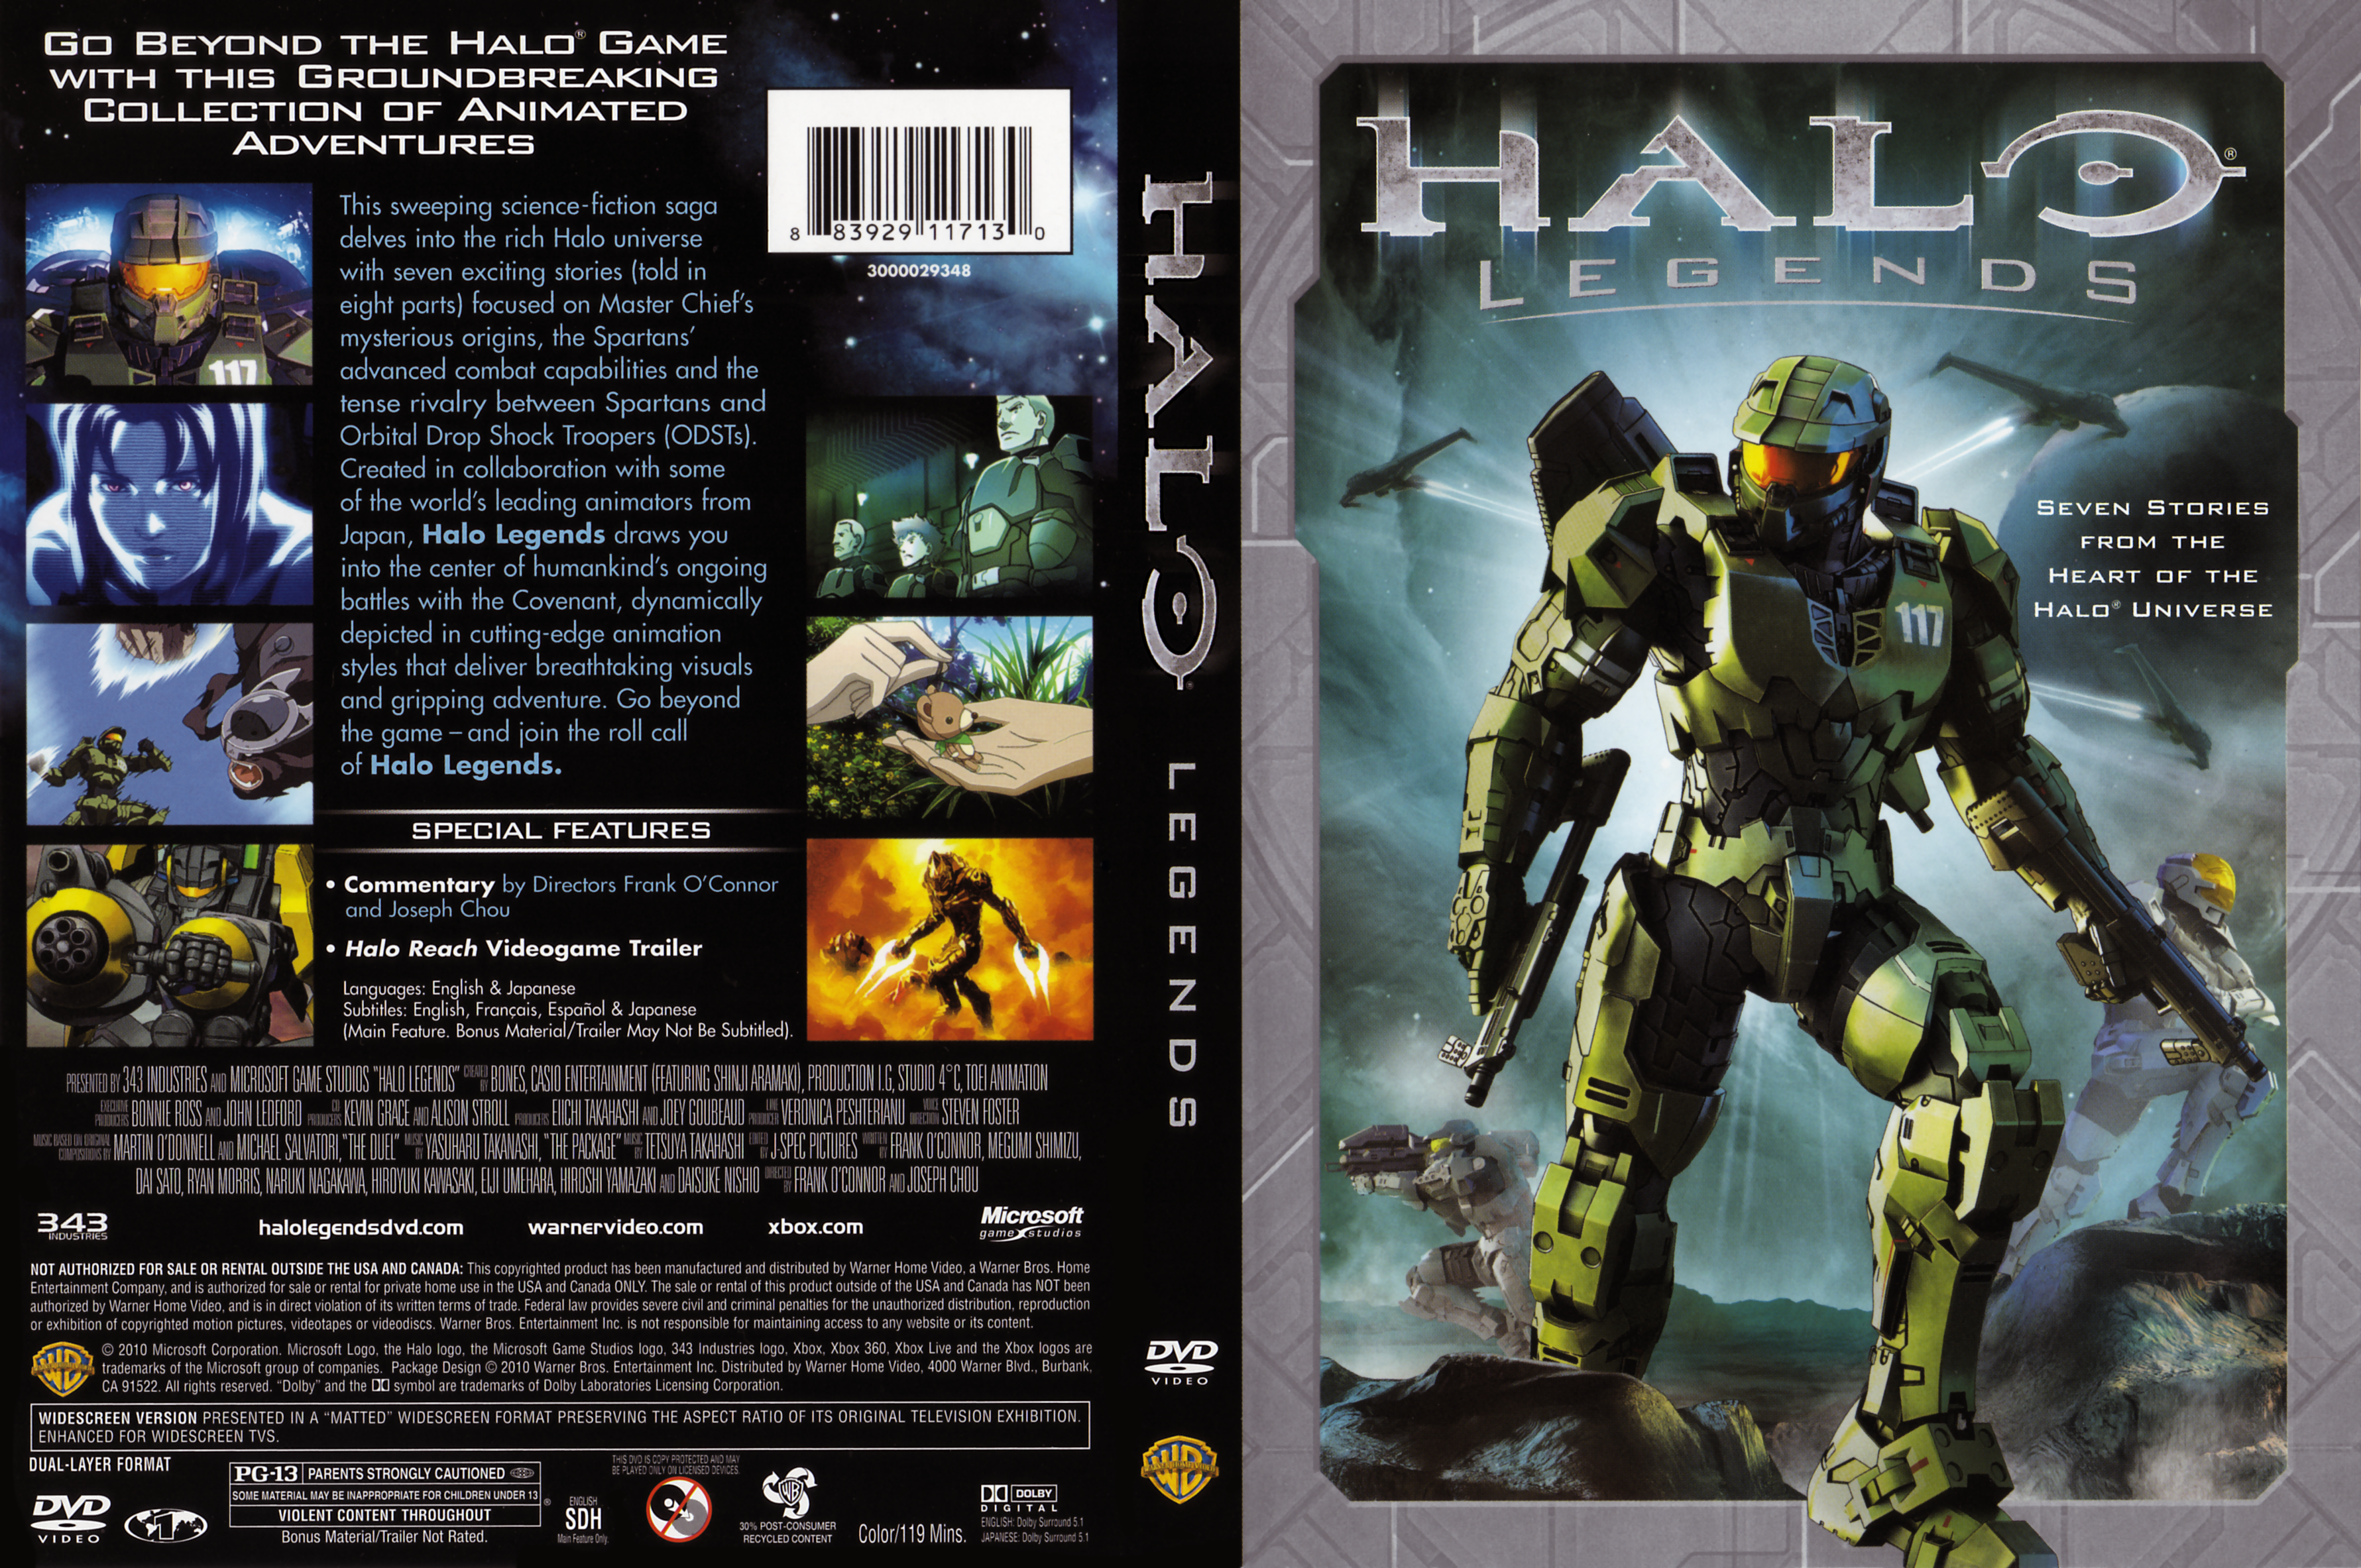 Halo Legends #10